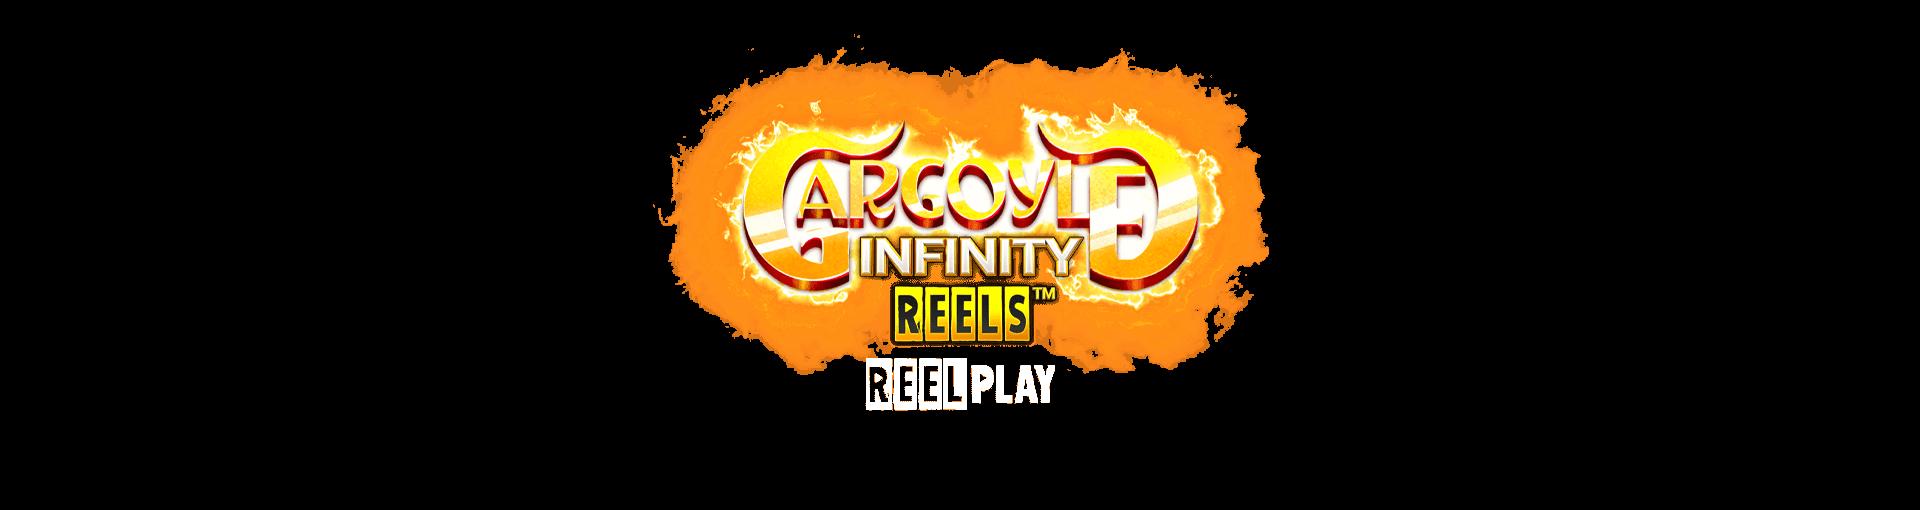 gargoyle_infinity_reels_Yggdrasil-UpcomingGame-Logo-Template-1920x510px